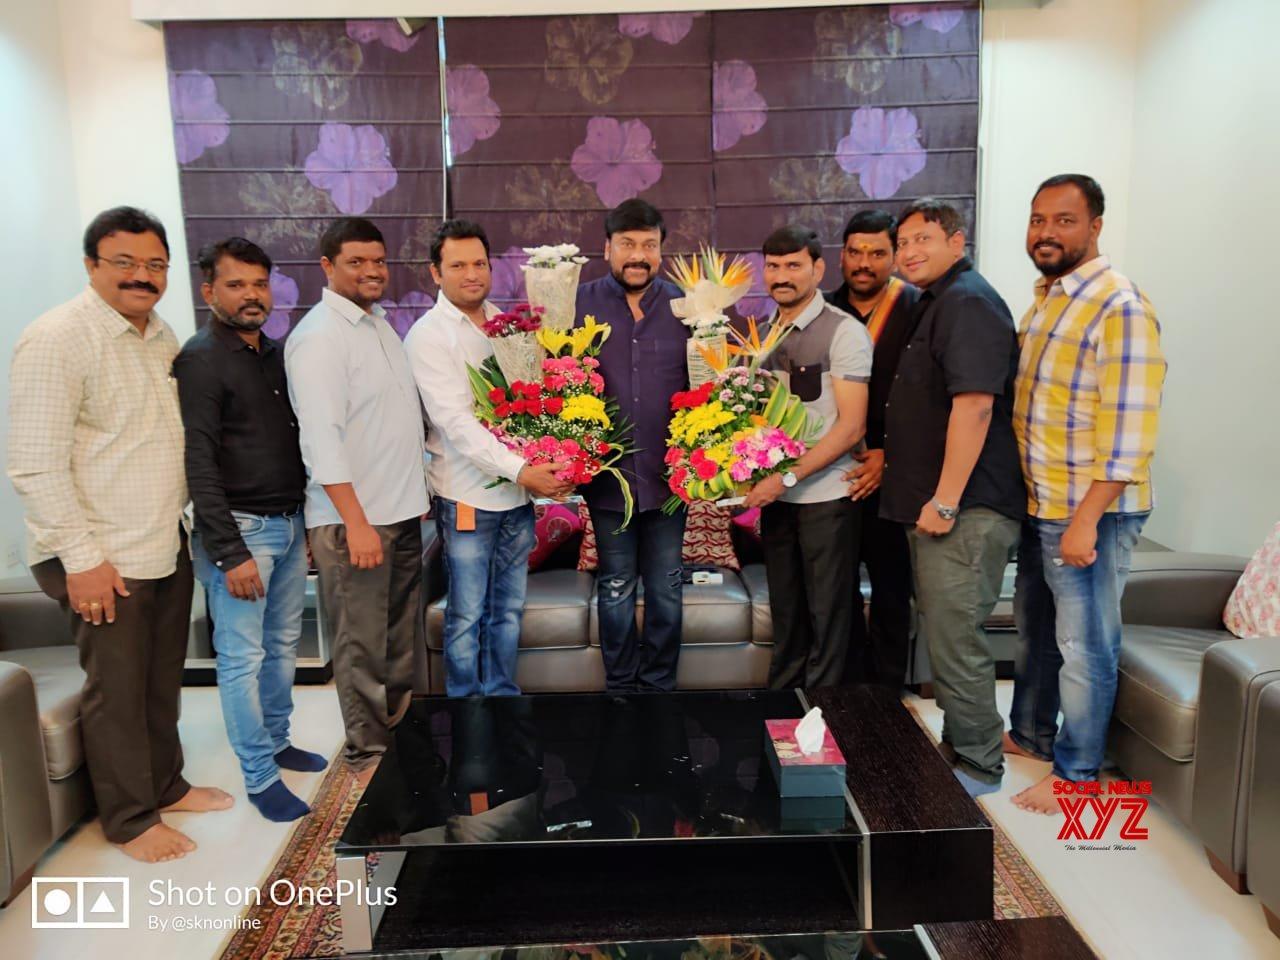 Team Film News Casters Congratulate Megastar Chiranjeevi On The Huge Success Of Magnum Opus Sye Raa Narasimha Reddy